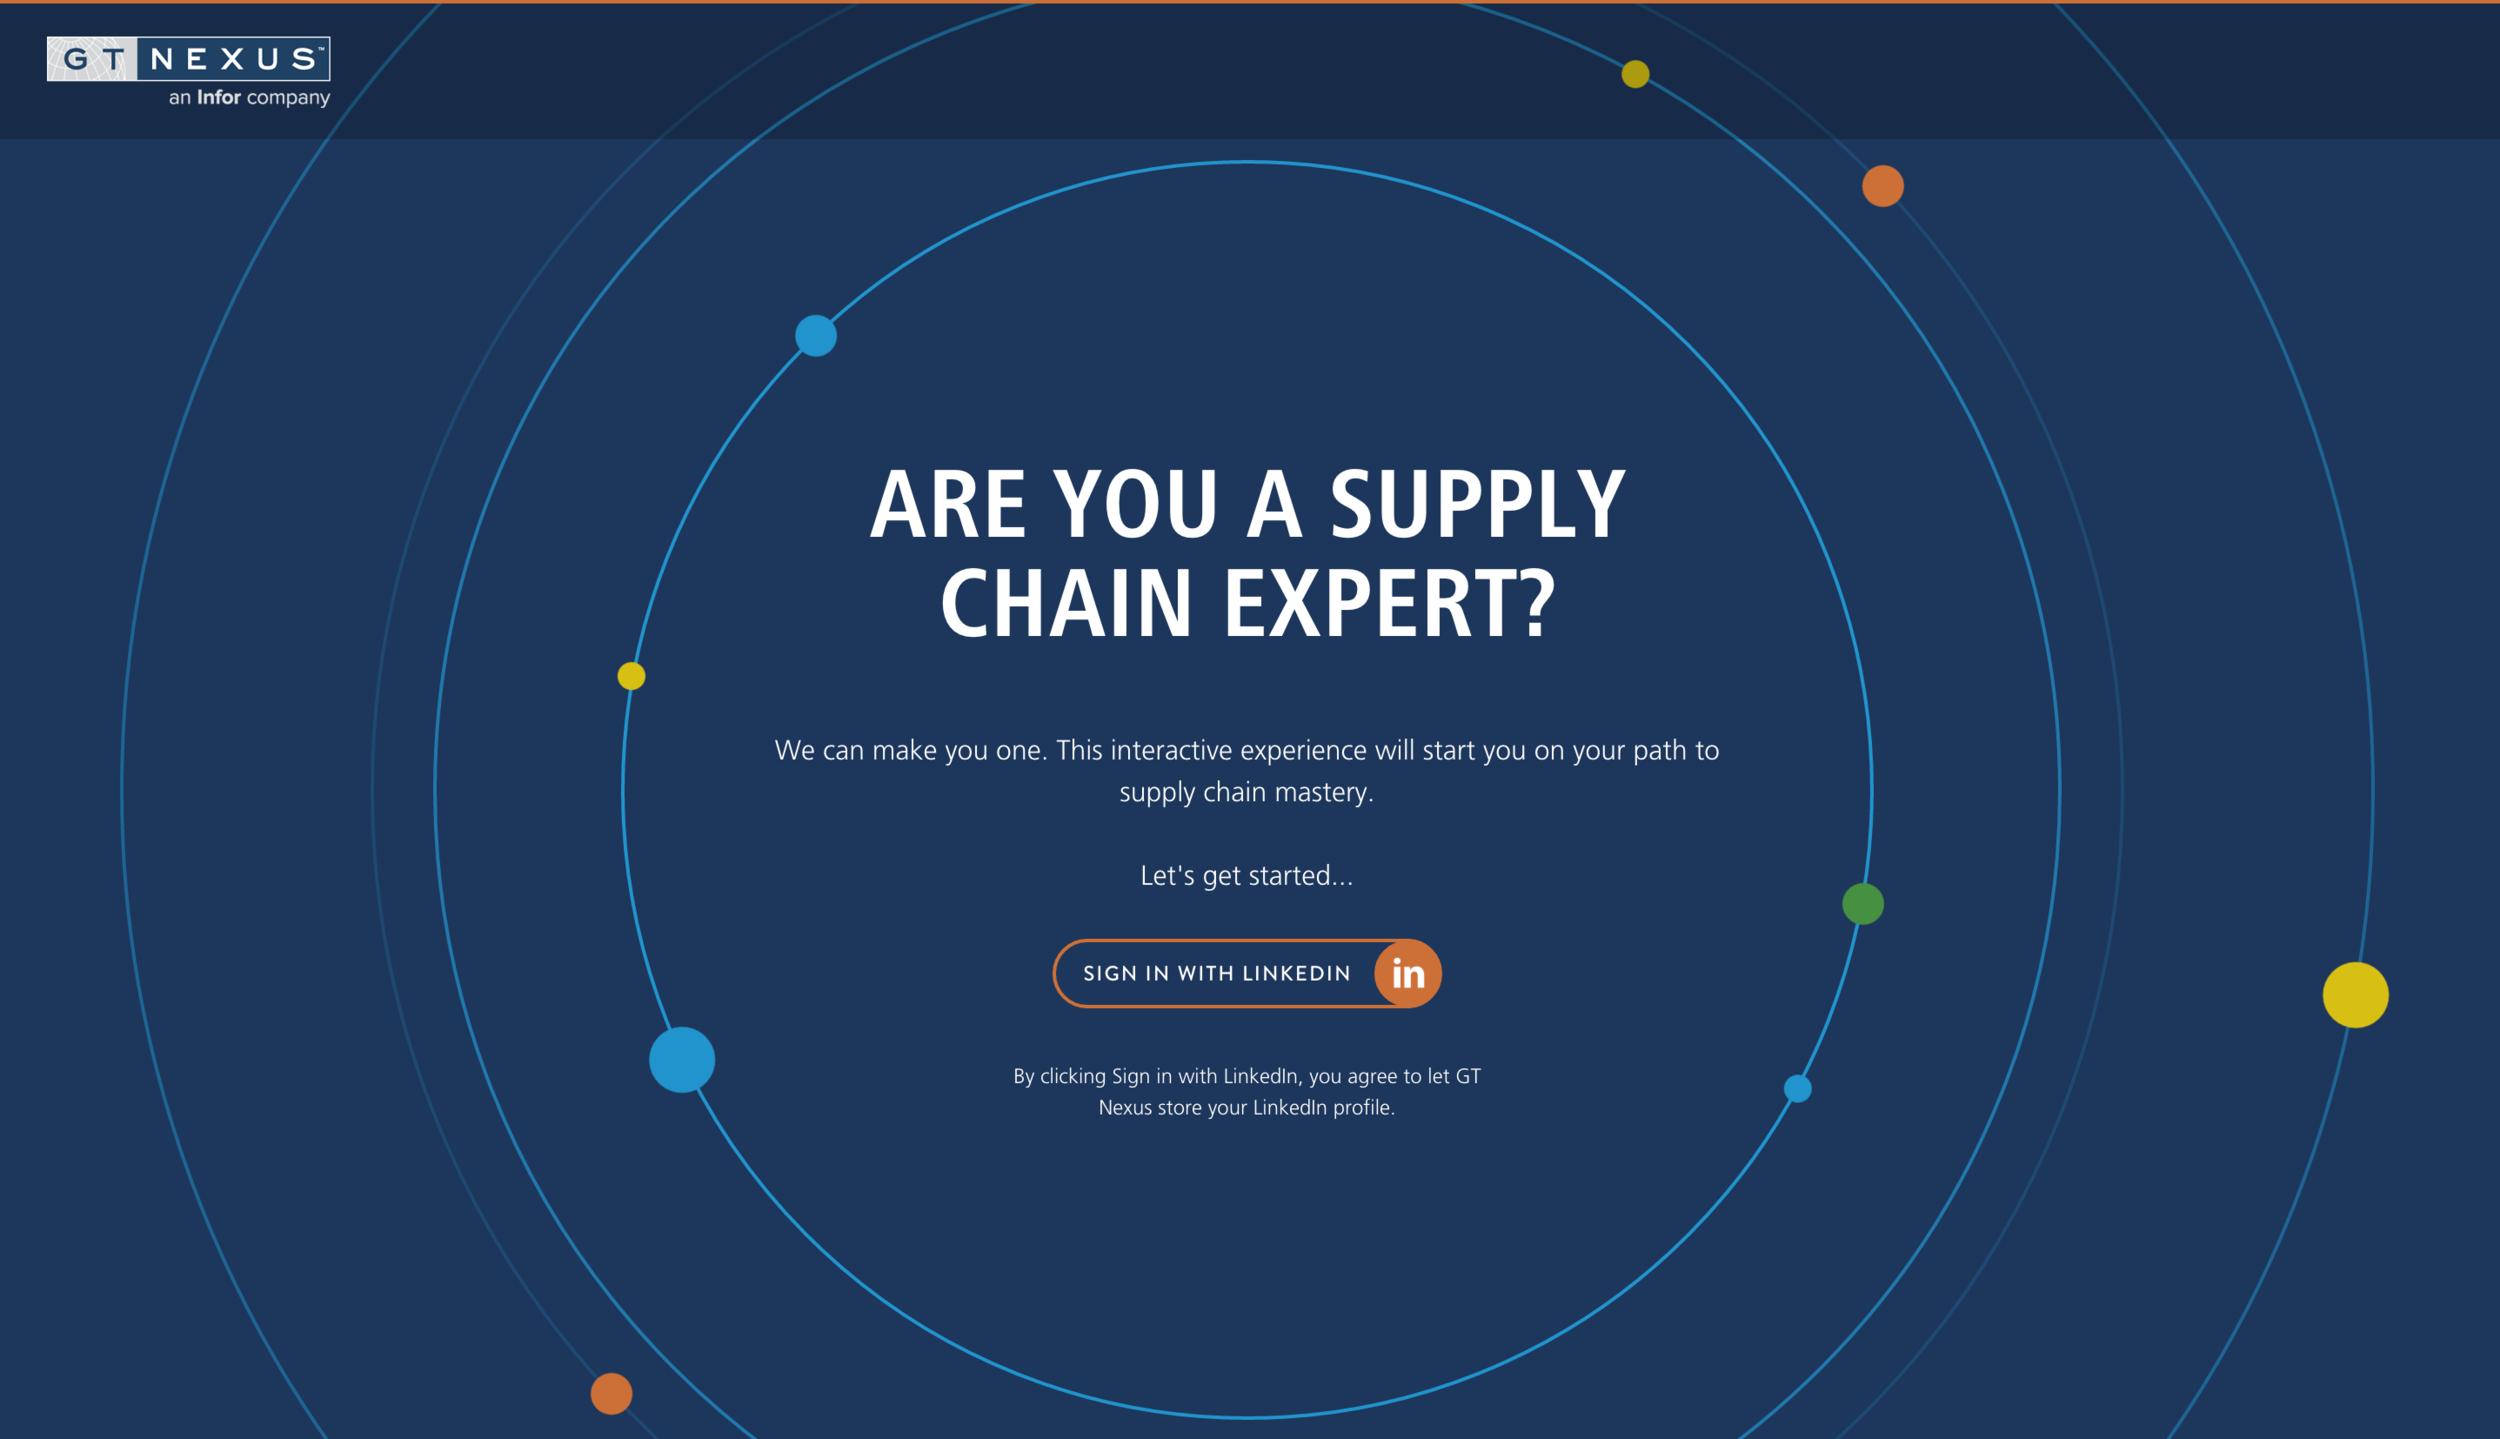 Supply Chain Expert App